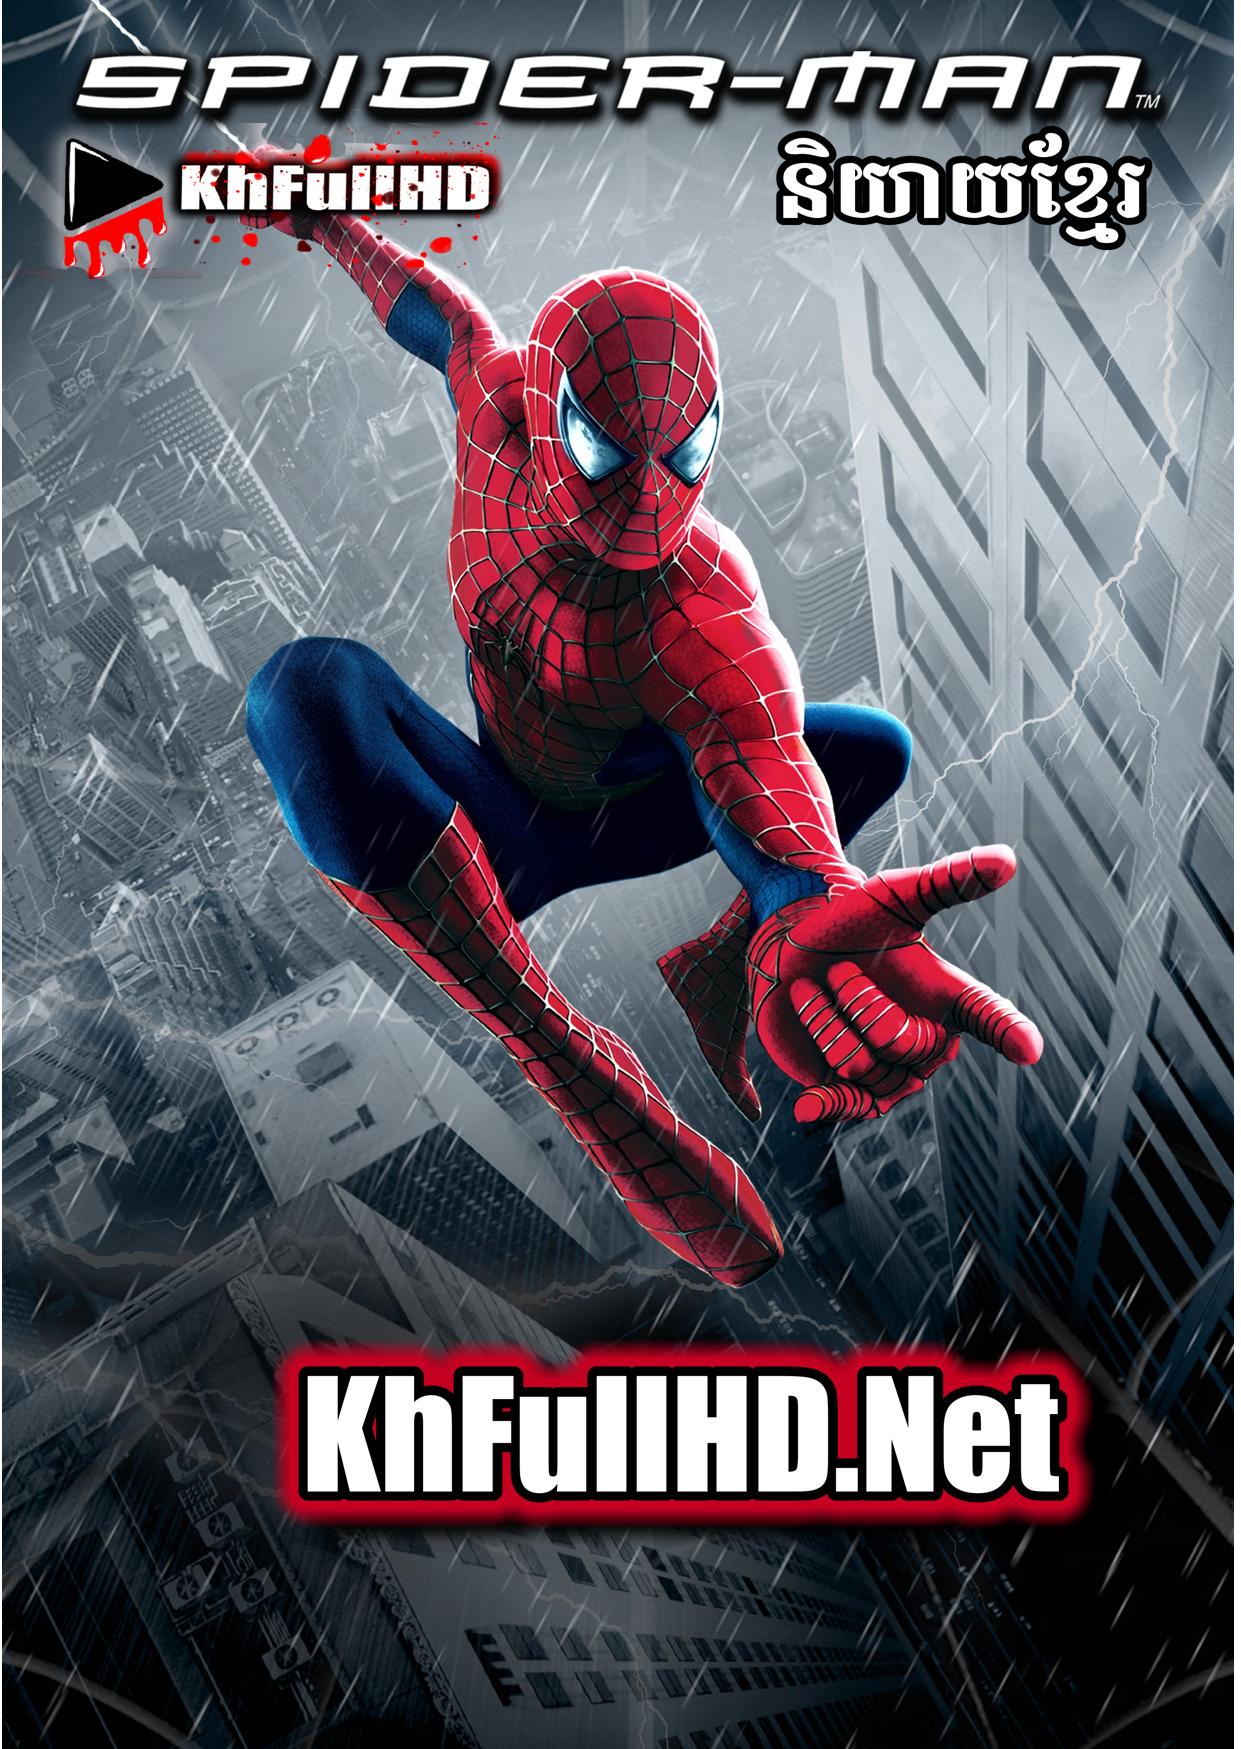 Spider-Man និយាយខ្មែរ (2002)